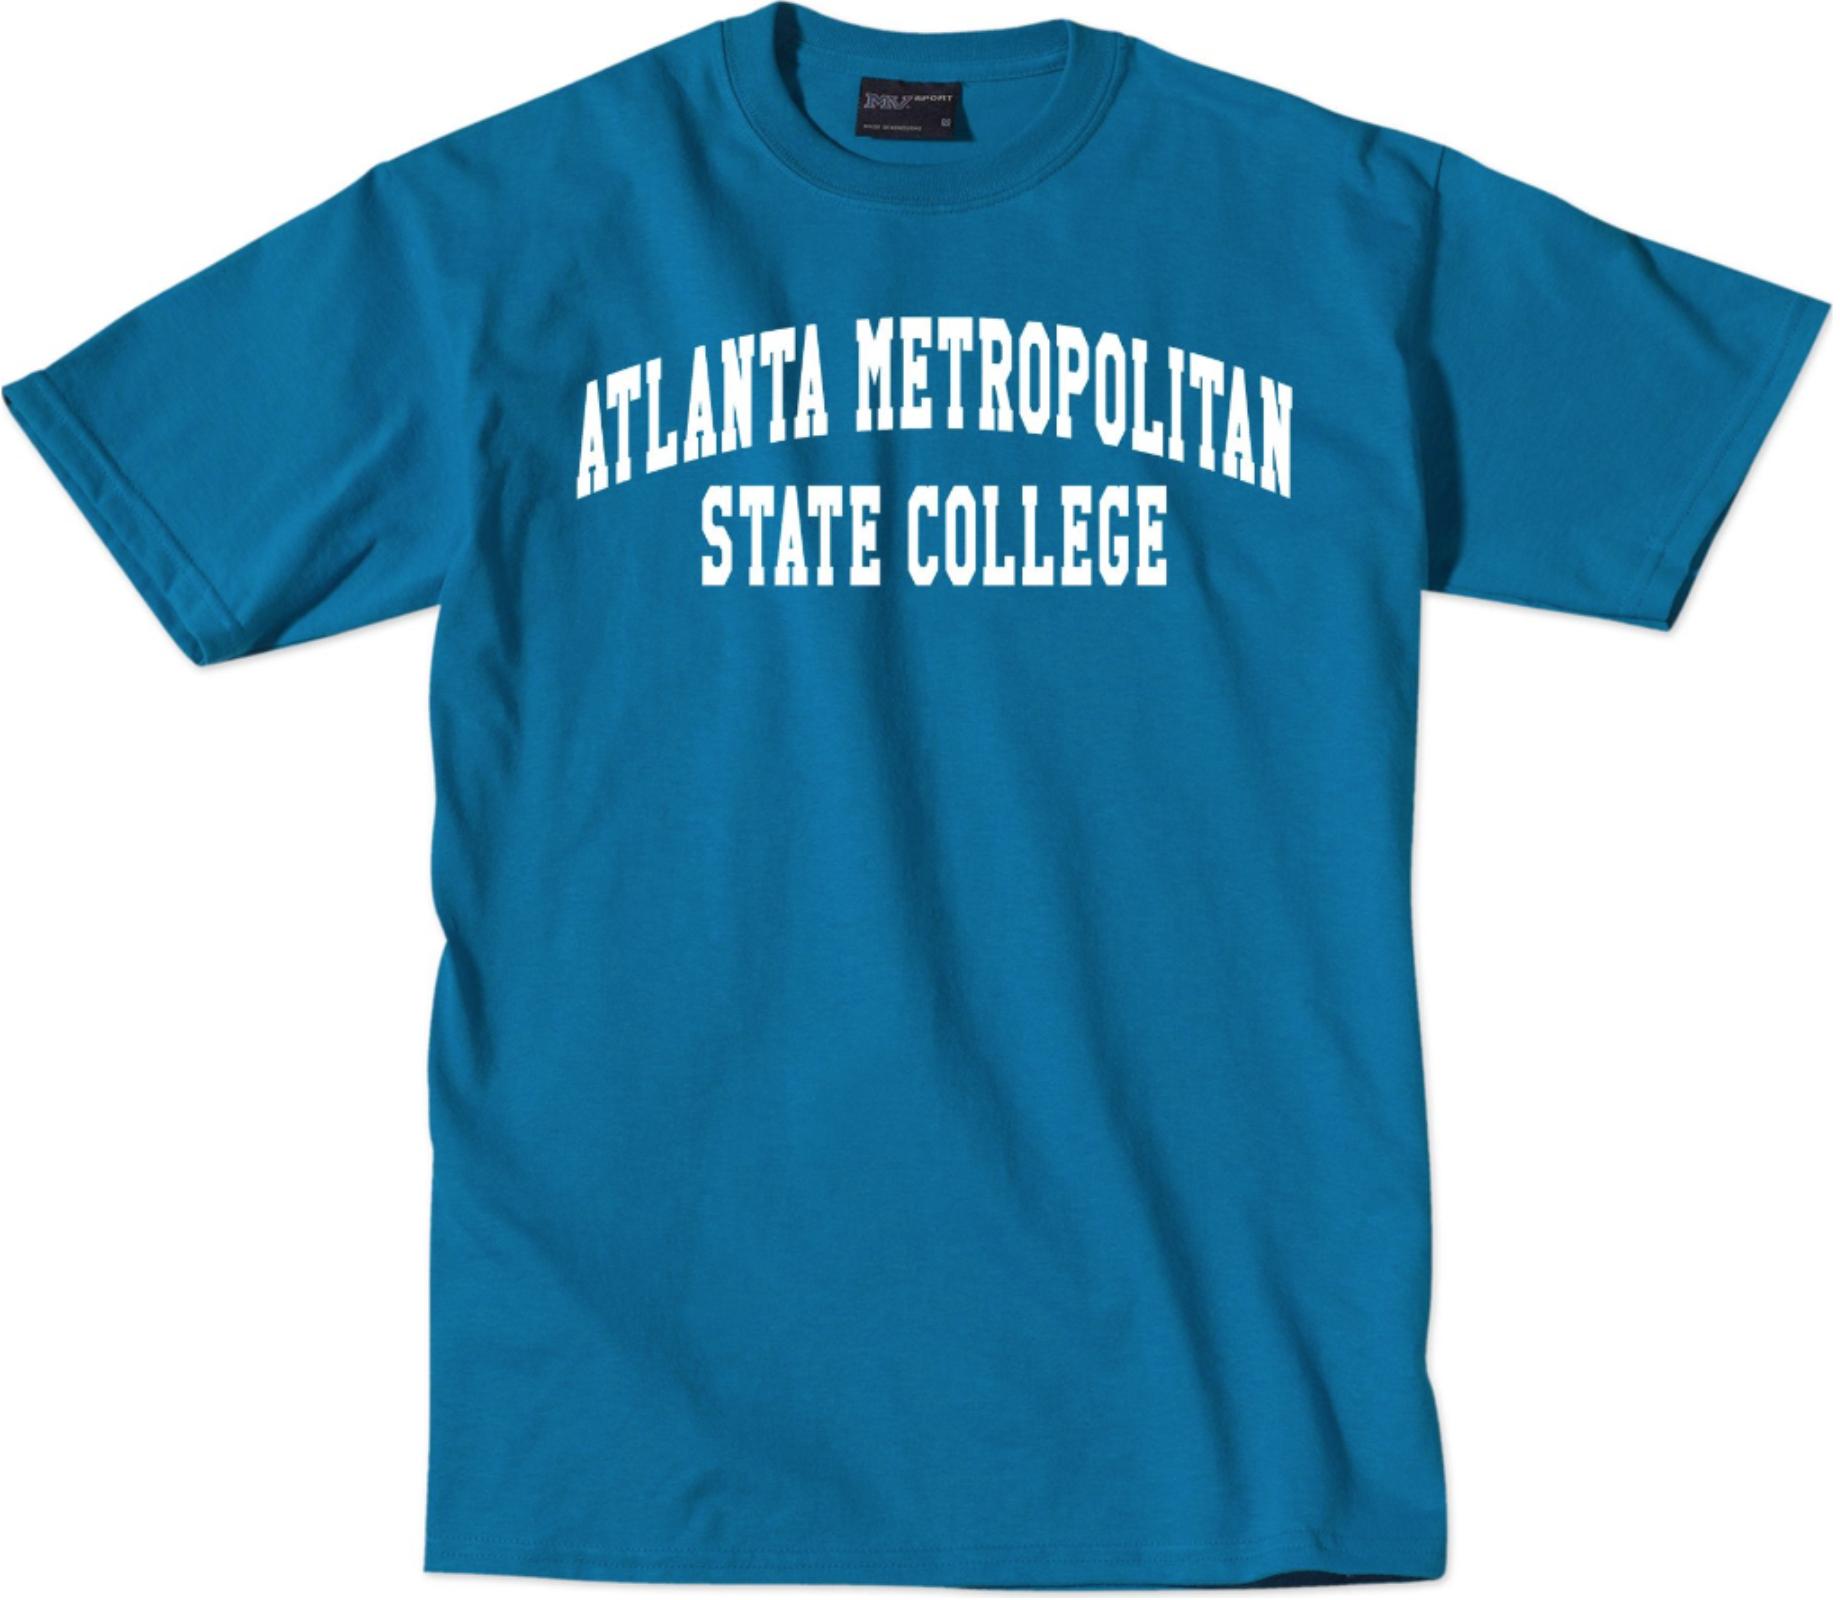 Atlanta Metropolitan State College Arch Short Sleeve T-Shirt